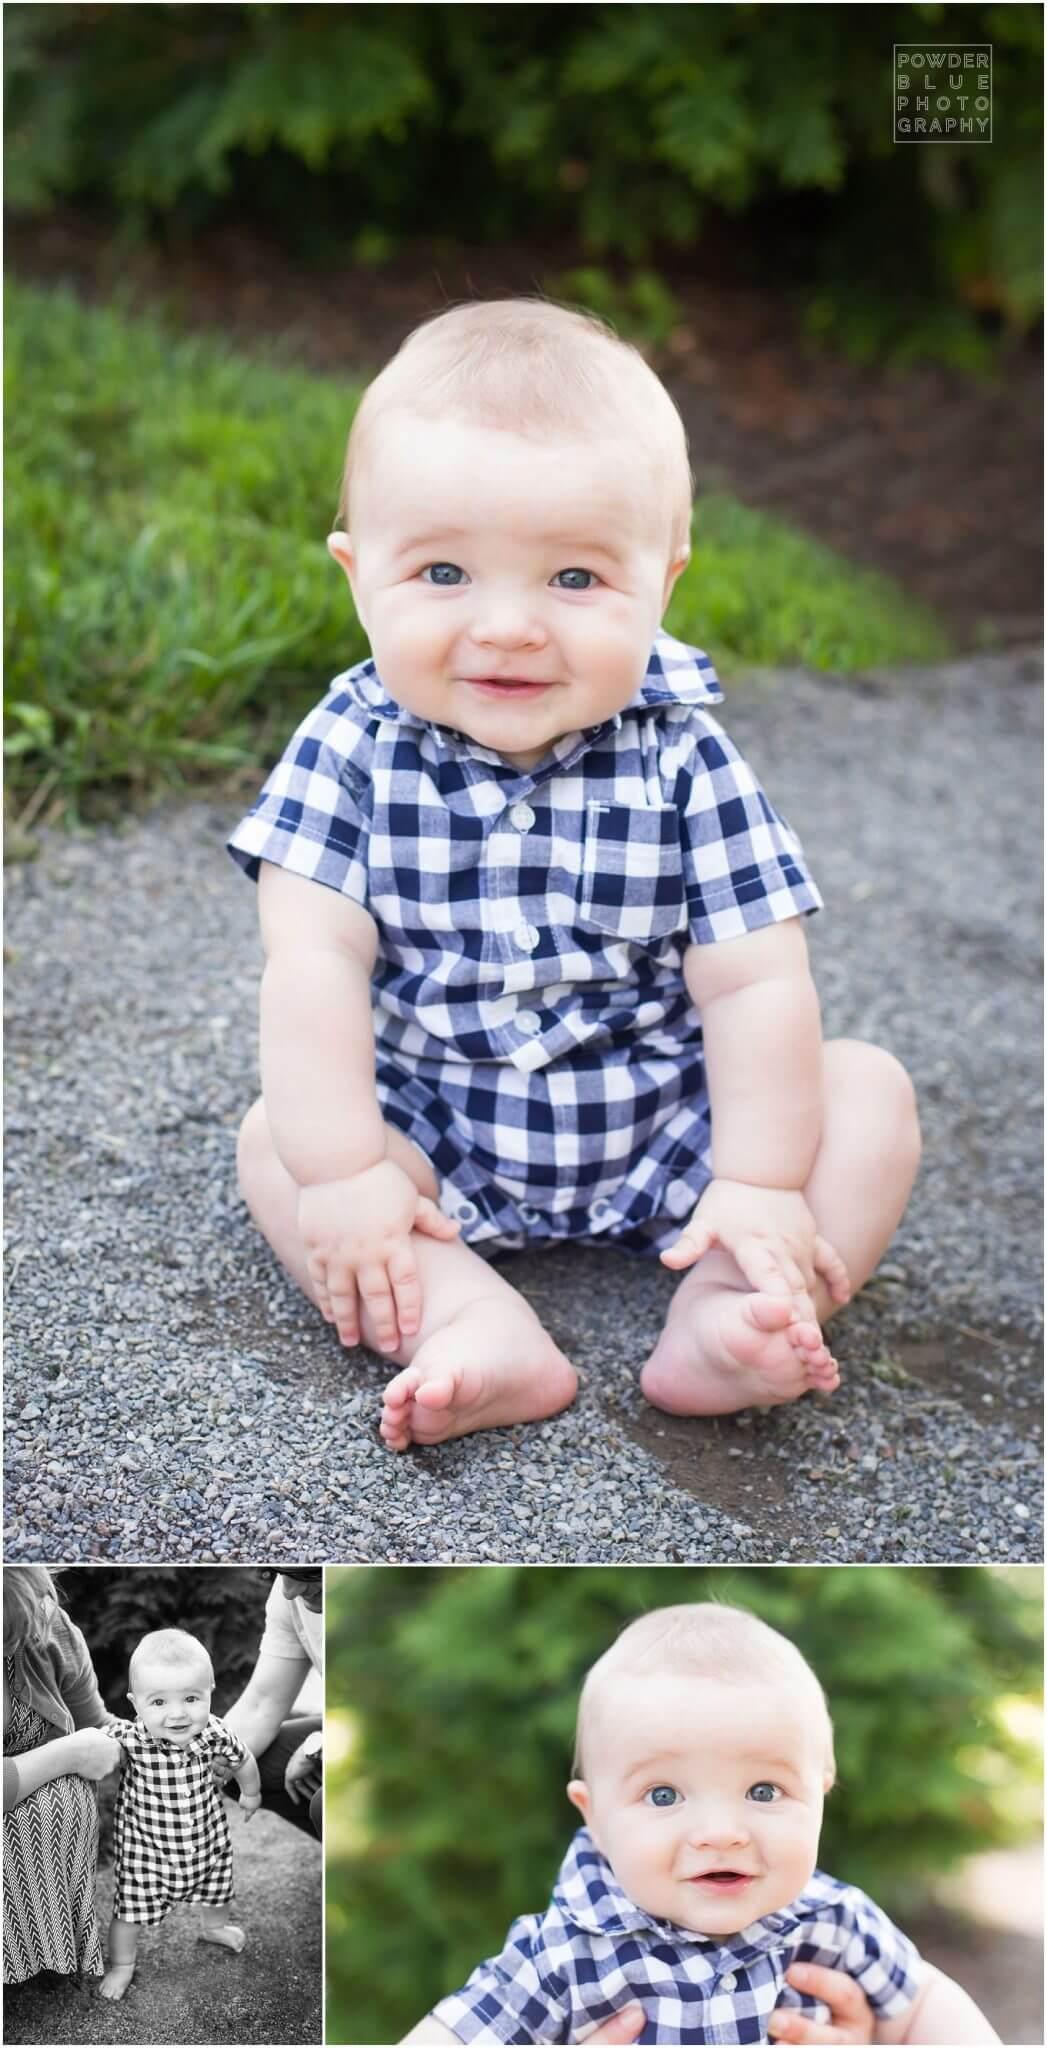 schepley park pittsburgh photographer 5 month old baby